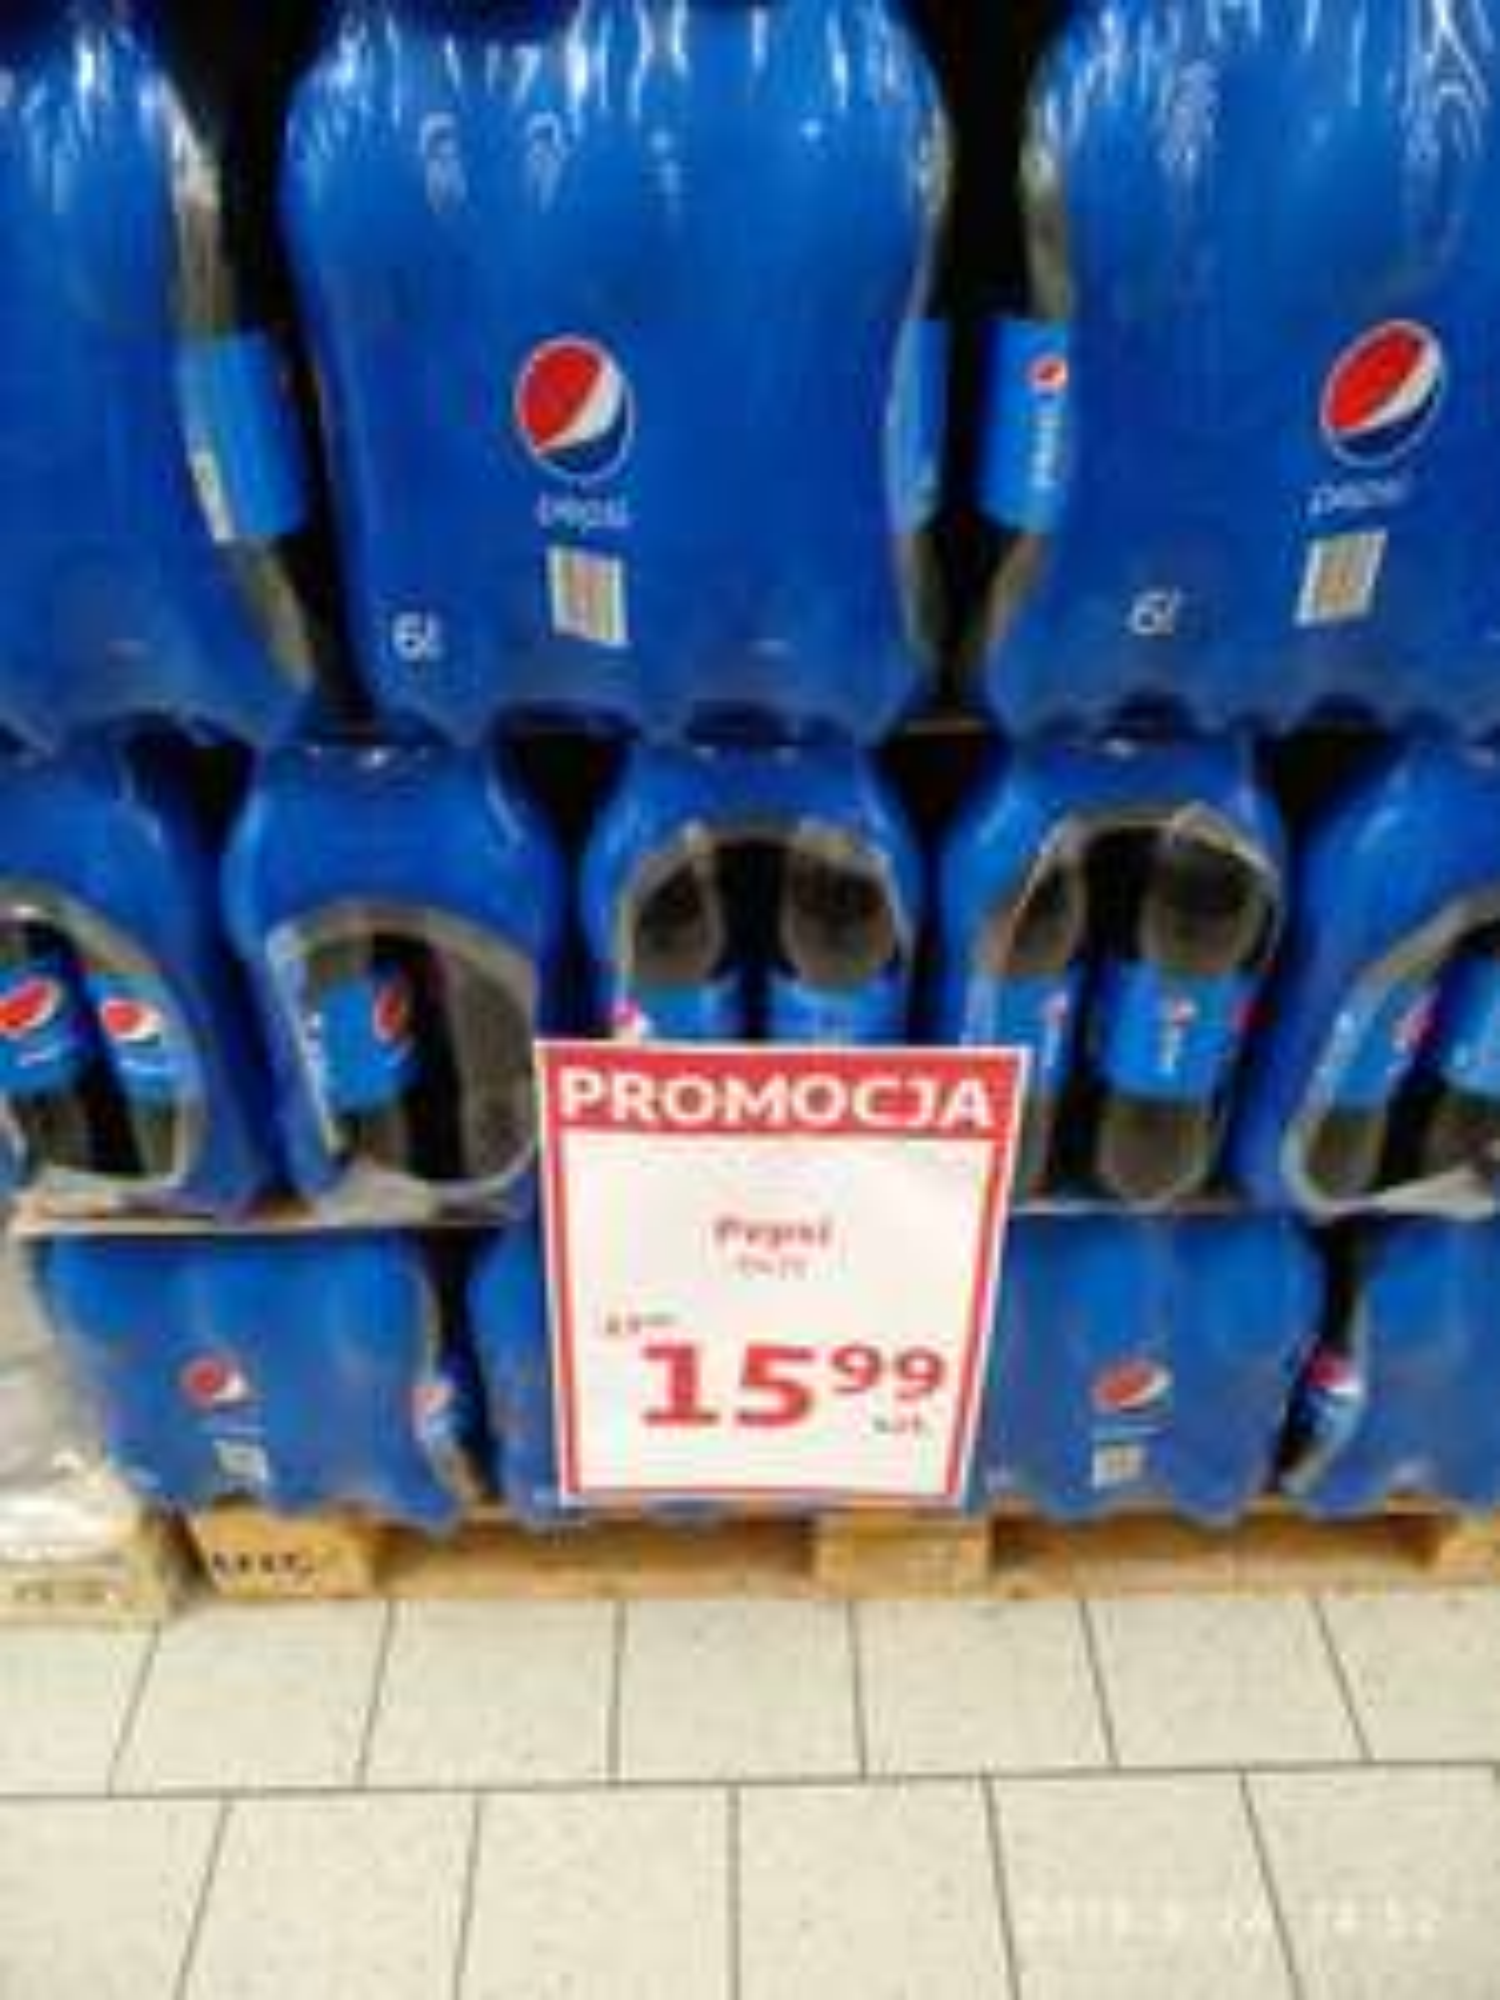 Pepsi 6x2L Auchan Nowy Sącz